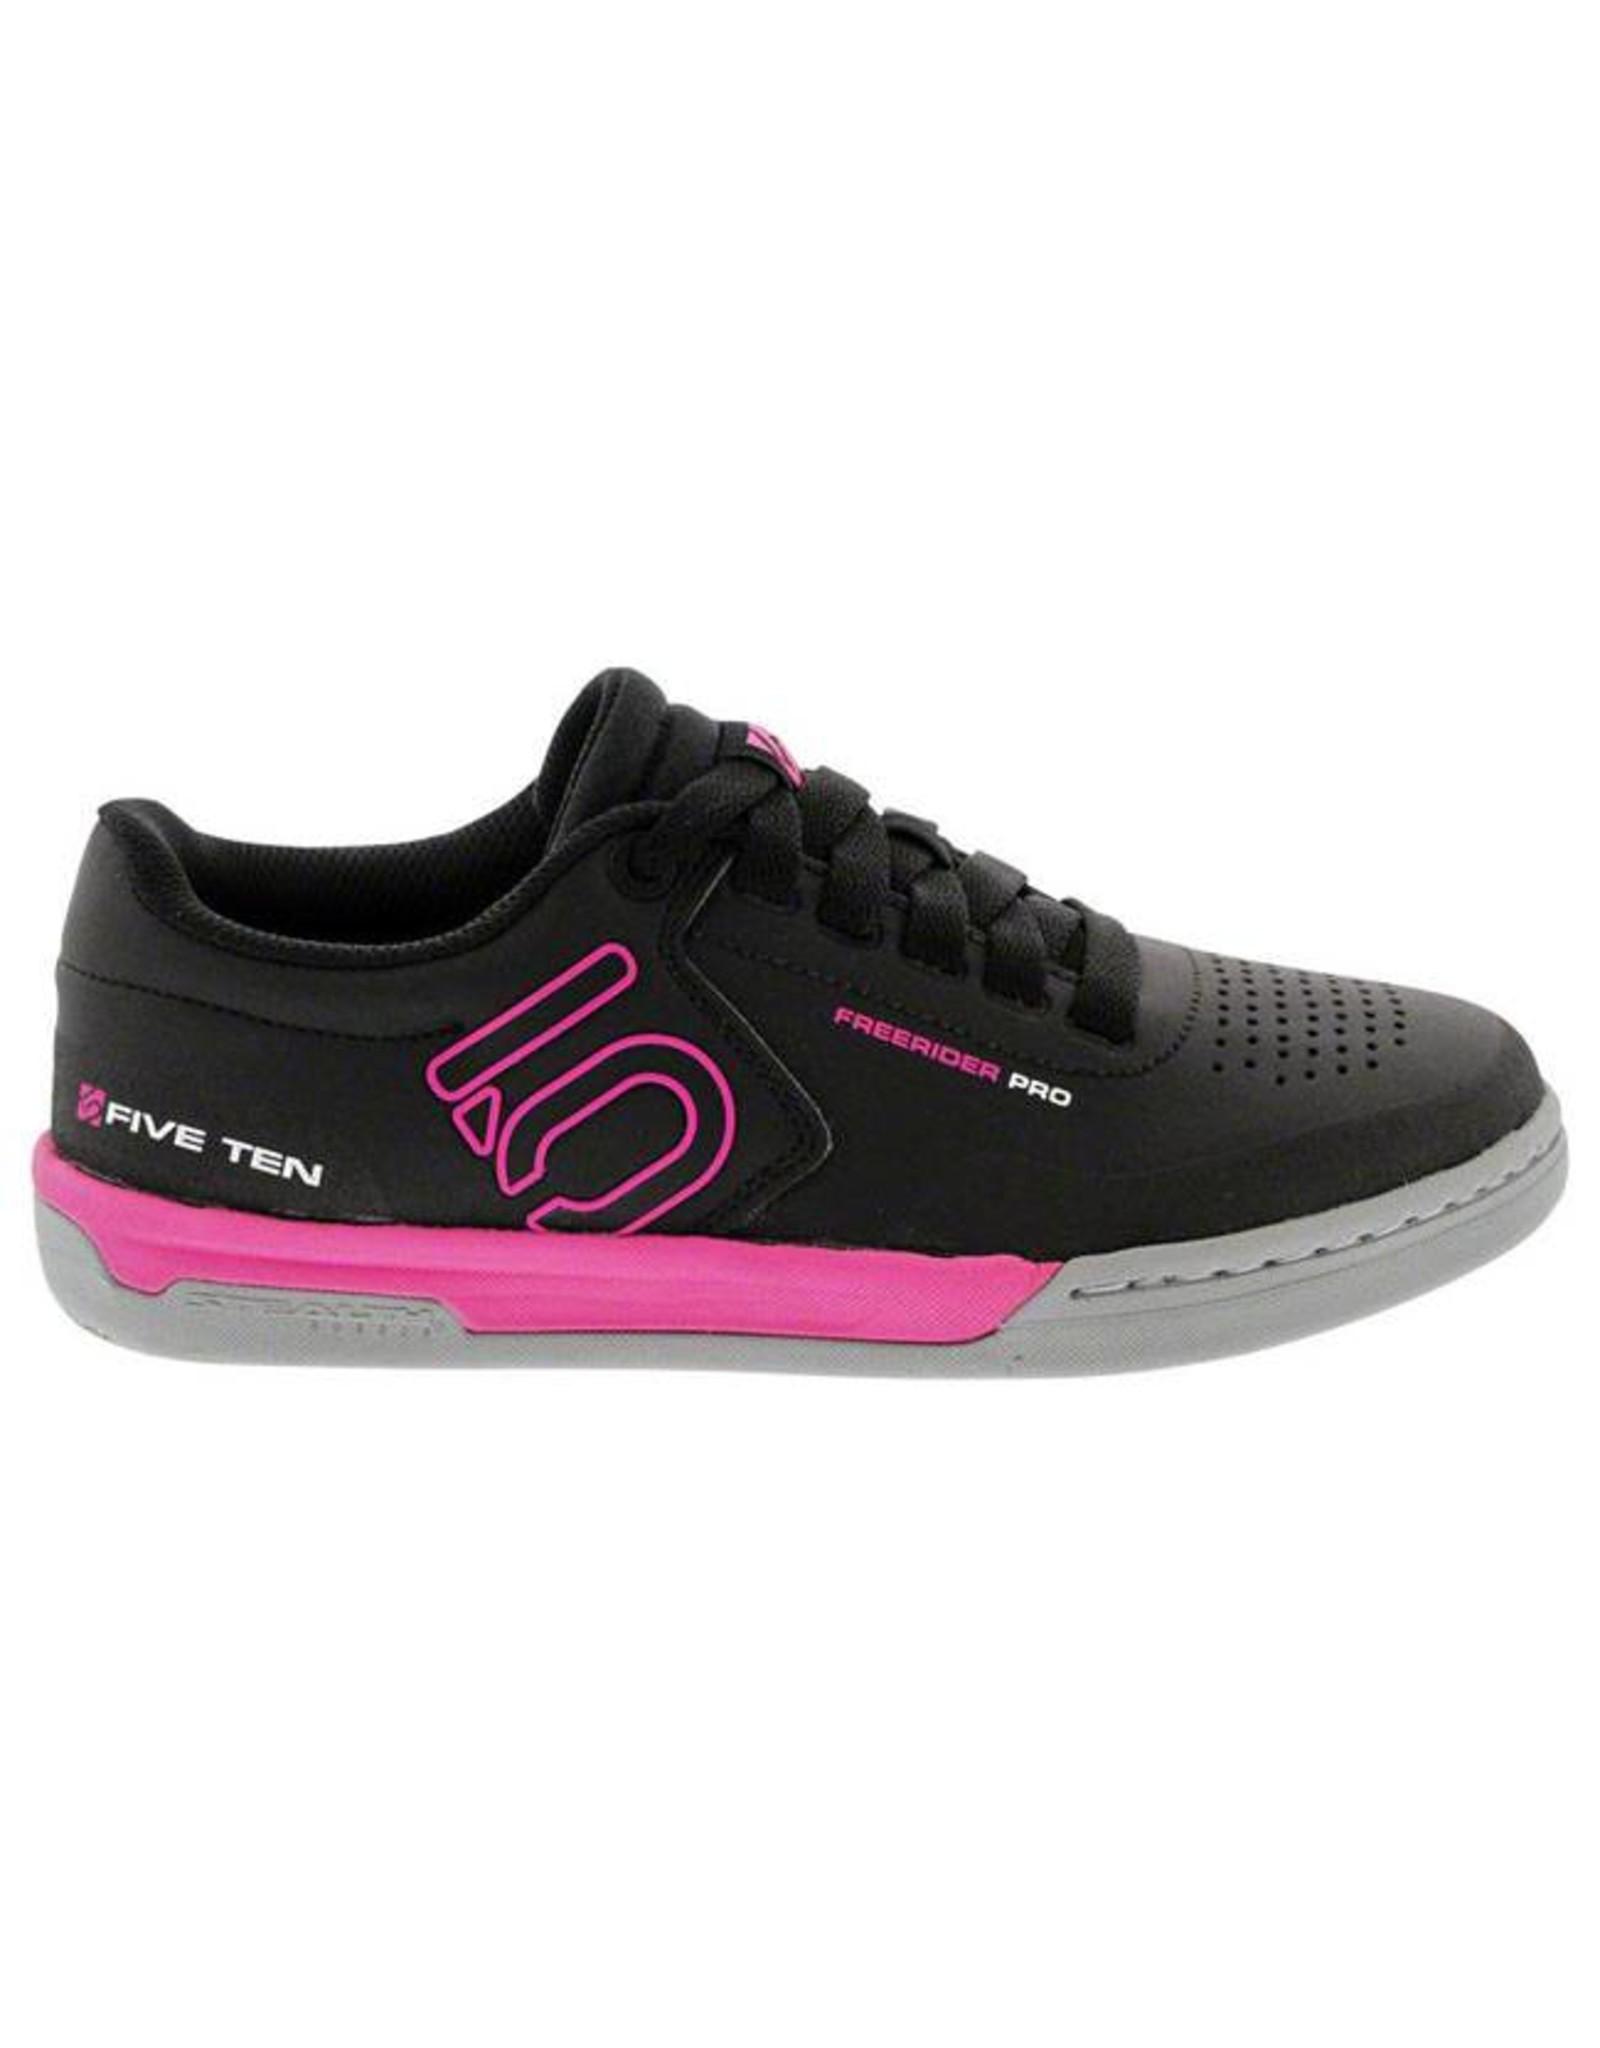 Five Ten Five Ten Freerider Pro Women's Flat Pedal Shoe: Black/Pink 9.5